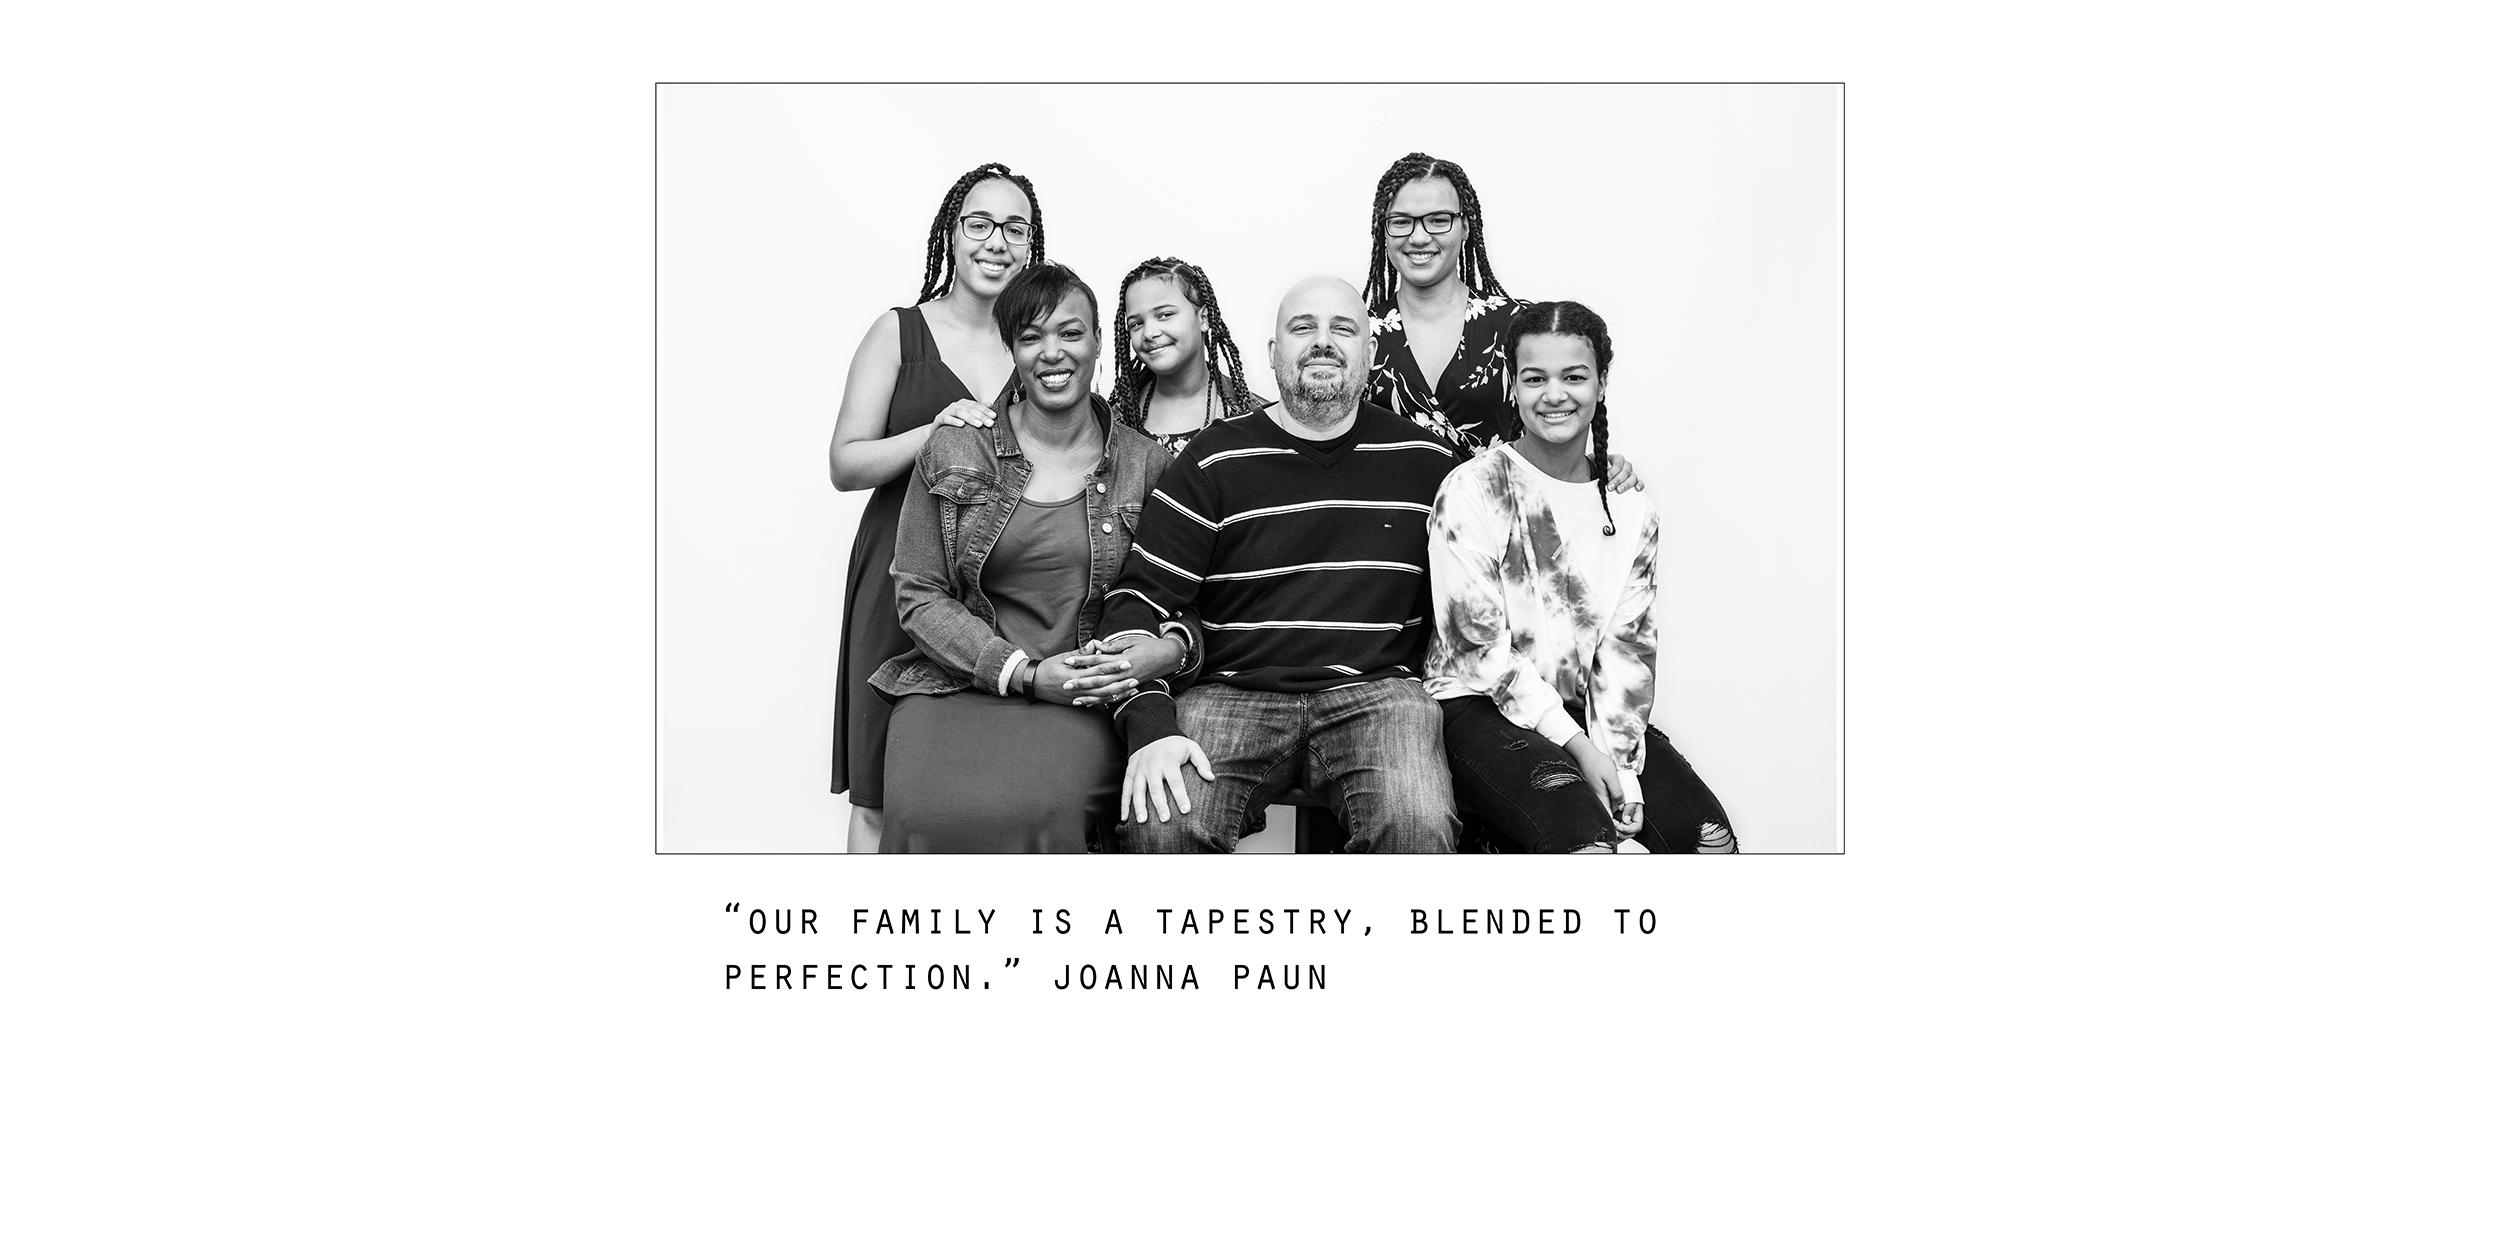 26-26-48-Joanna